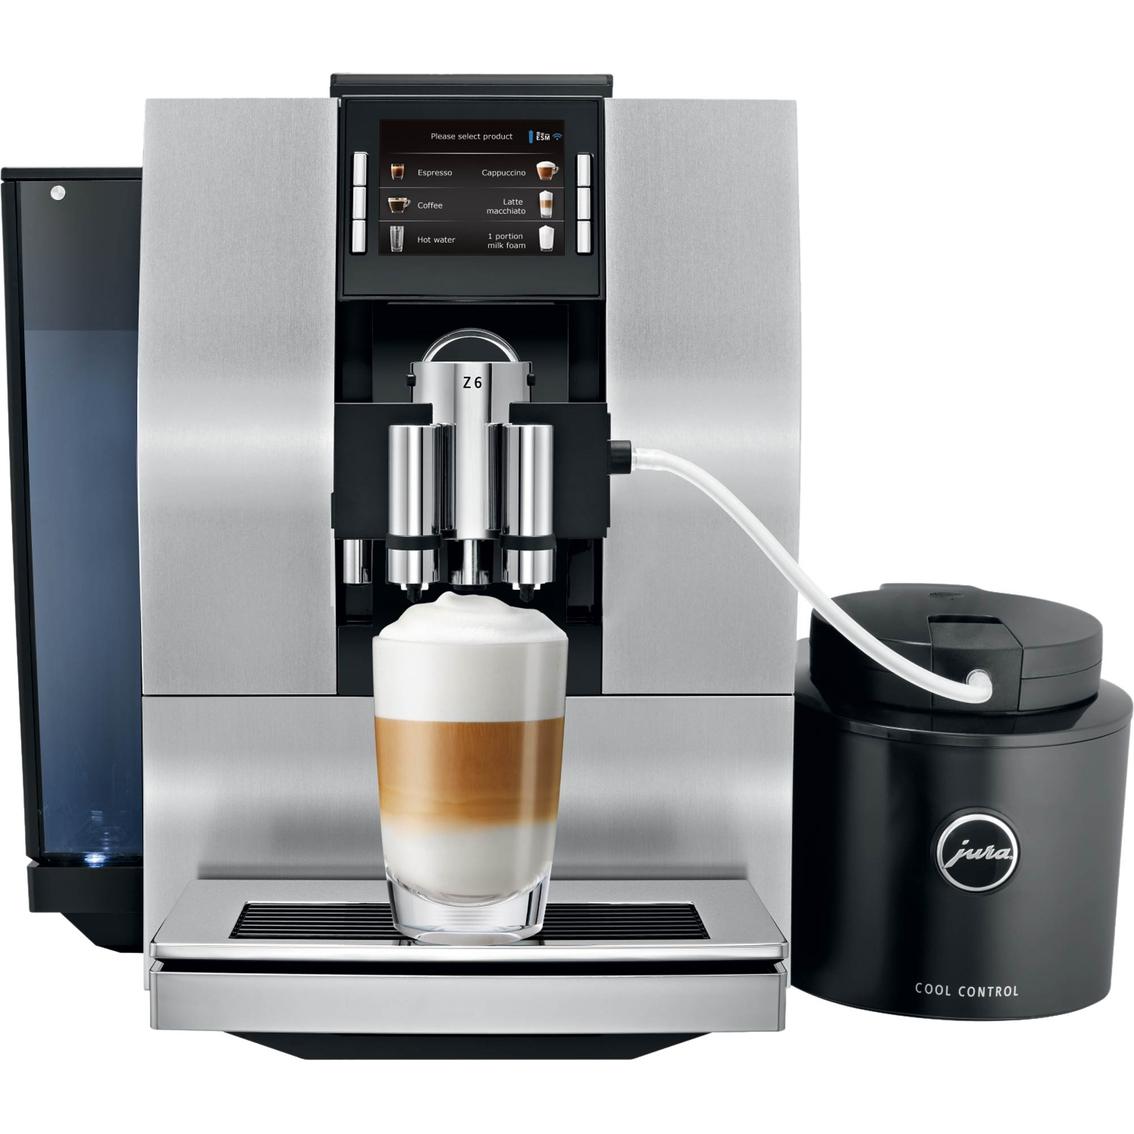 8213677 LEEQ How To Service A Coffee Machine Ristretto